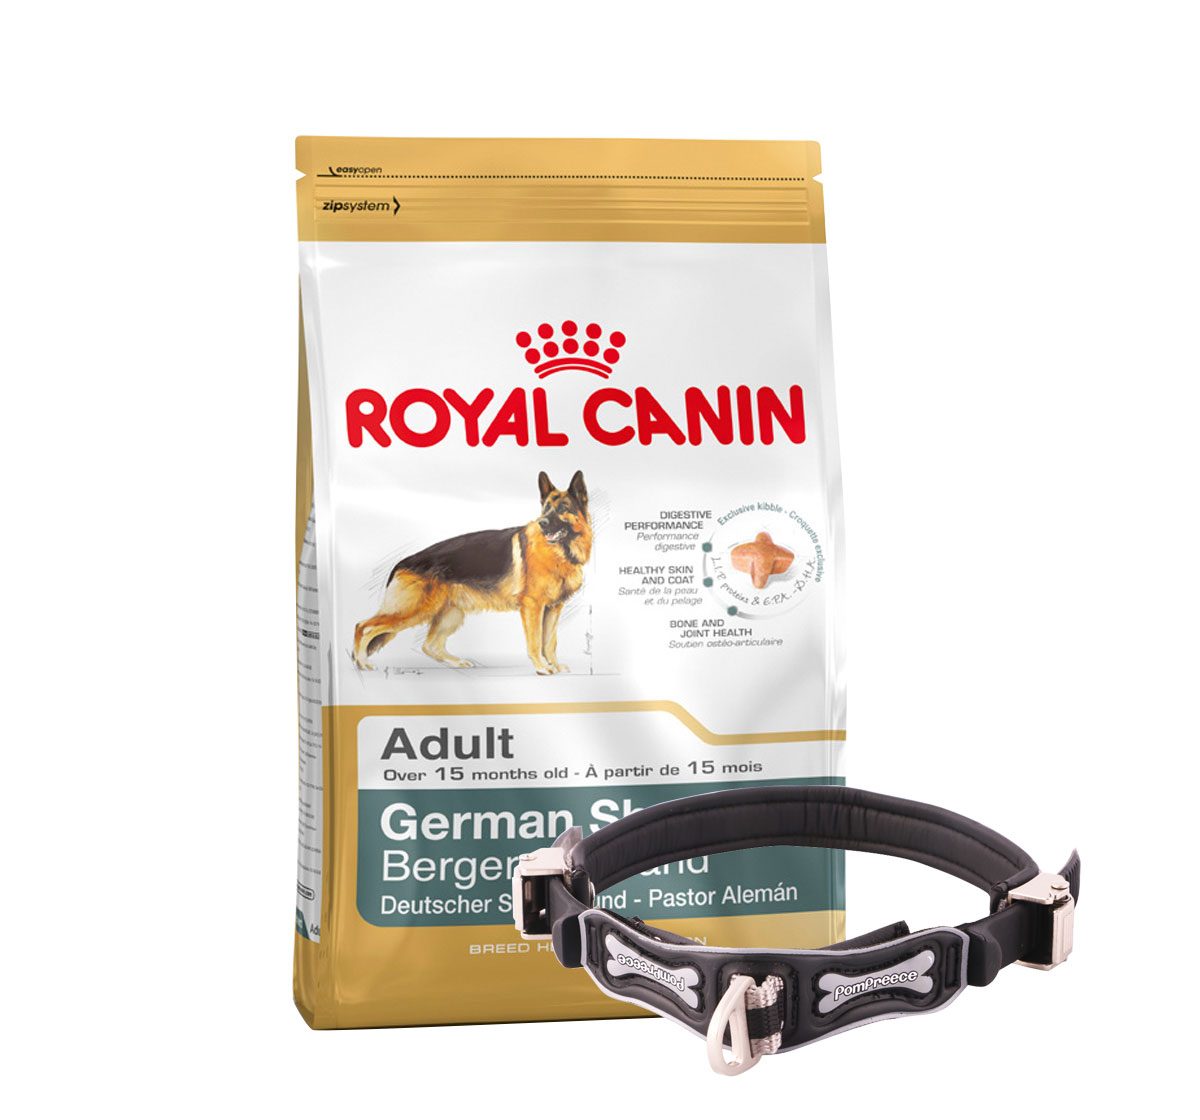 Royal Canin German Shepherd Adult - 3 Kg With Ergocomfort Dog Collar Large-Black